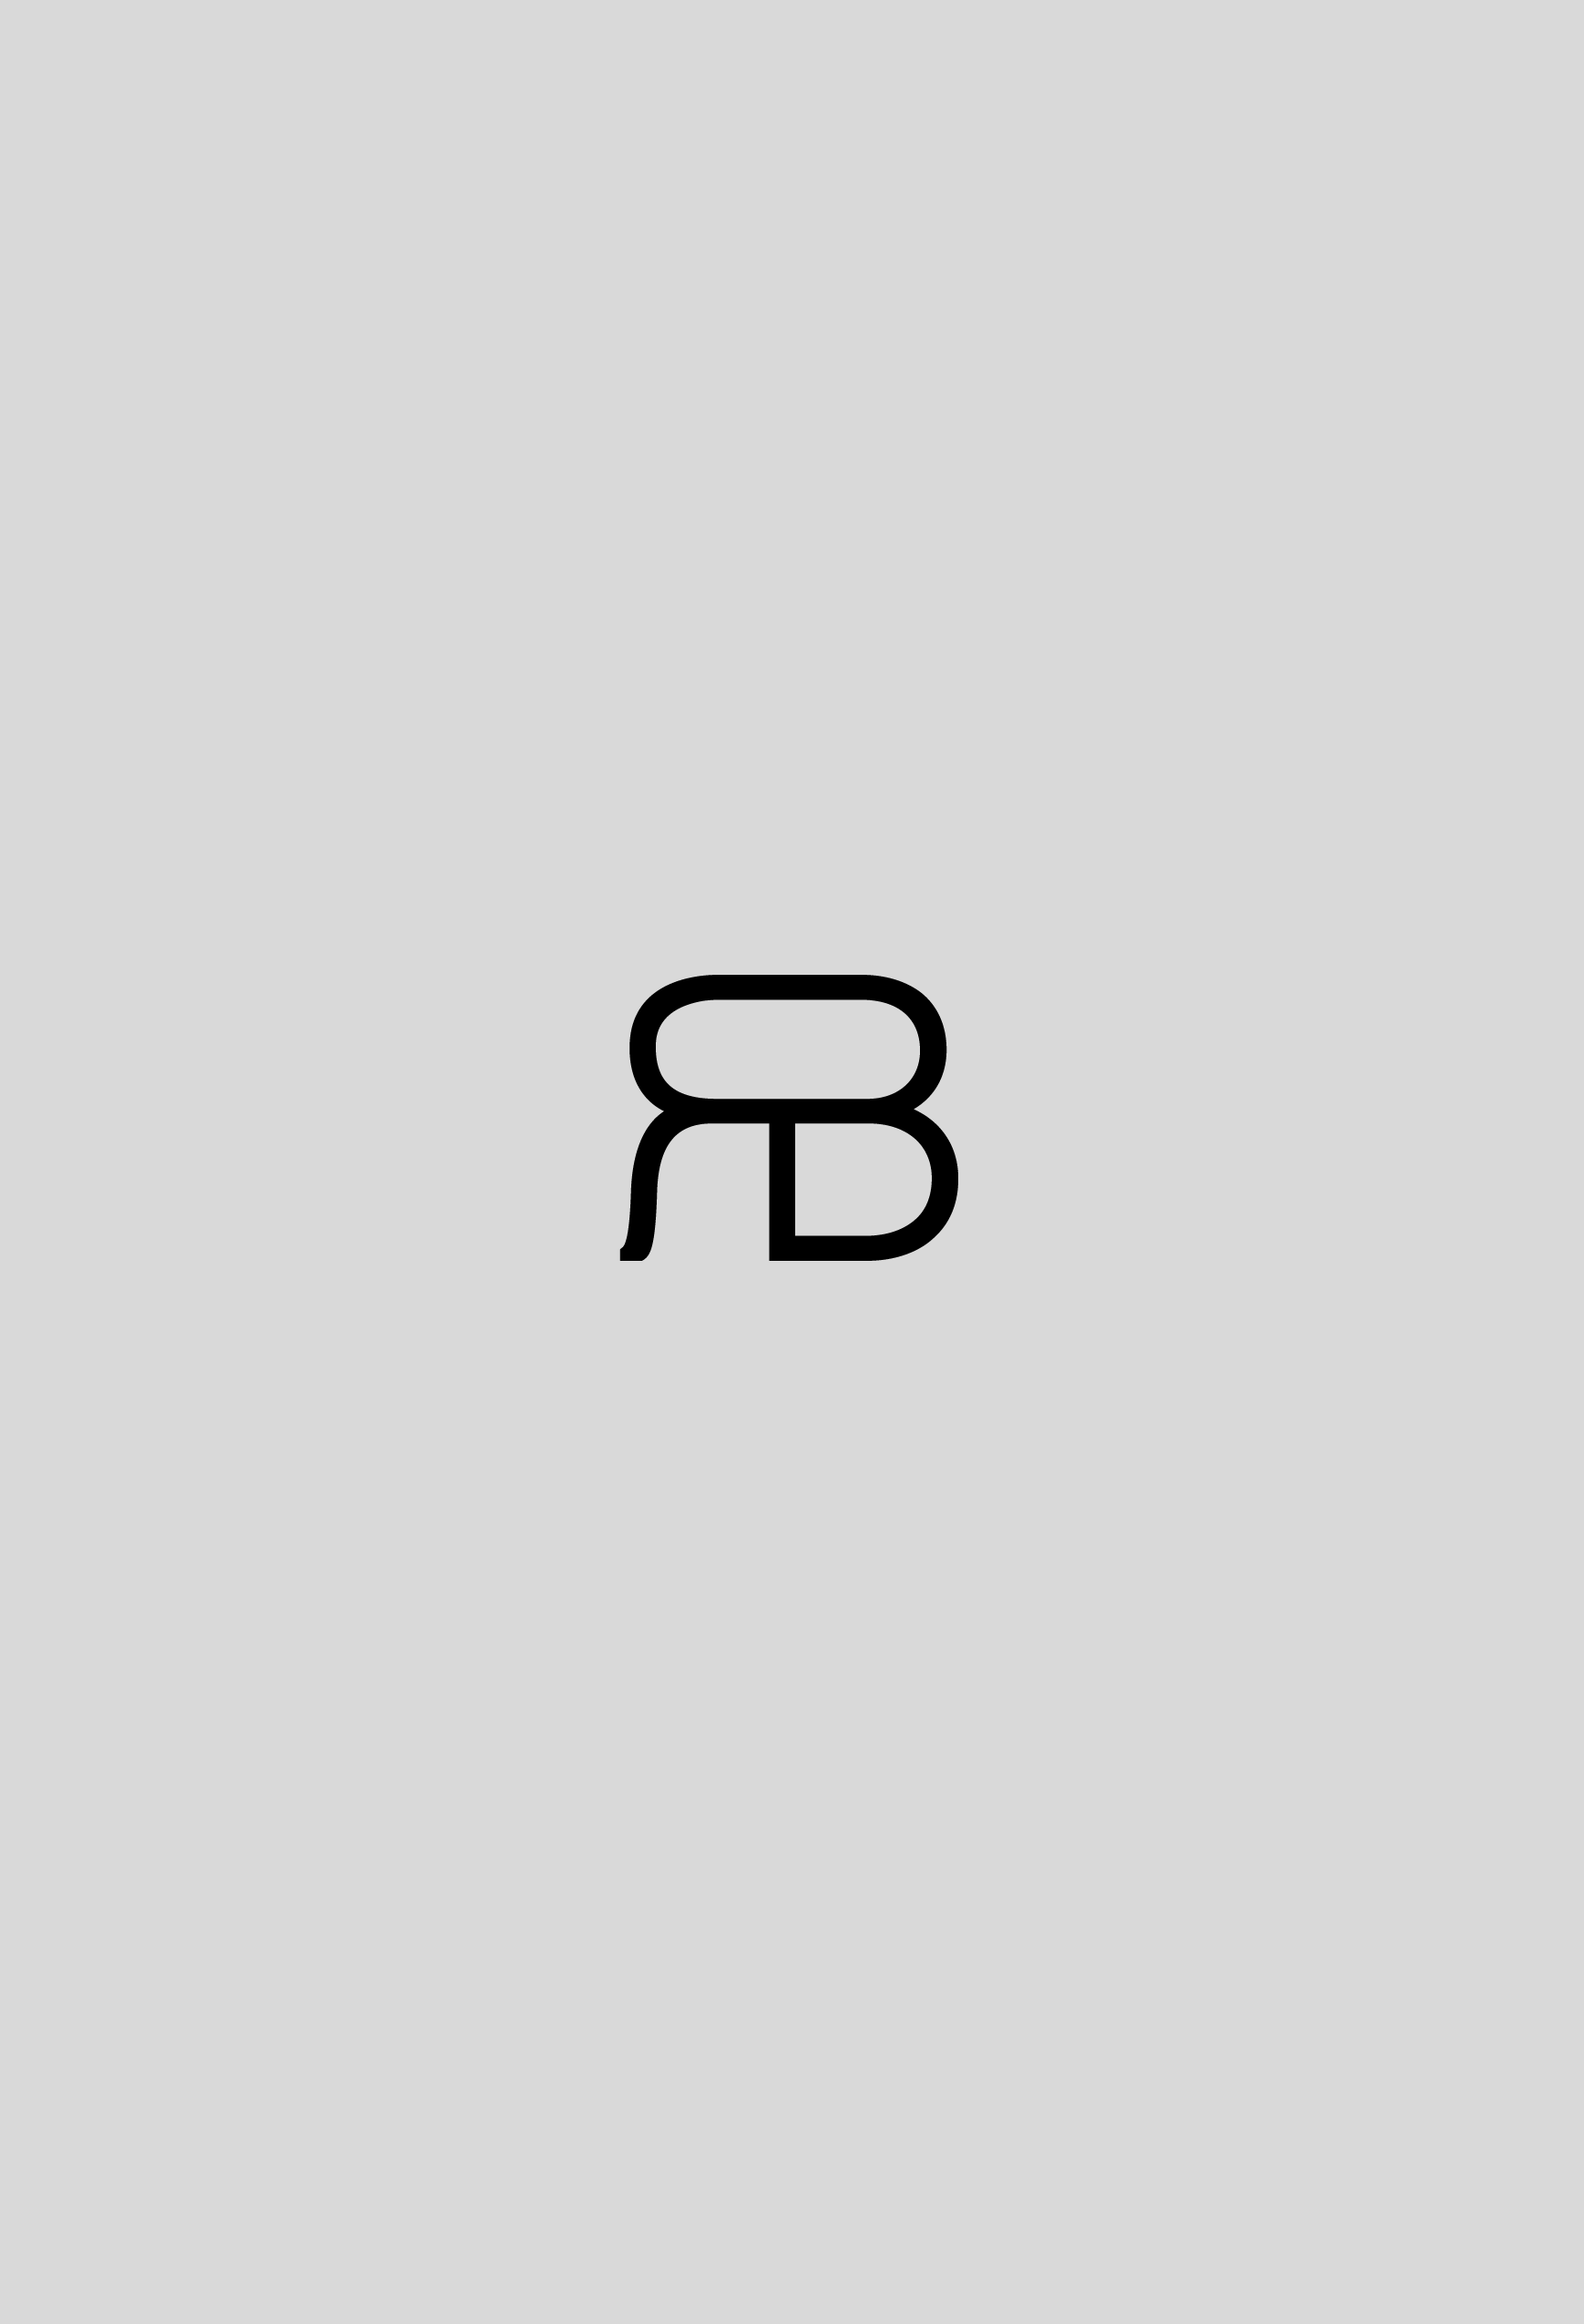 raluca buzura monogram black on light background